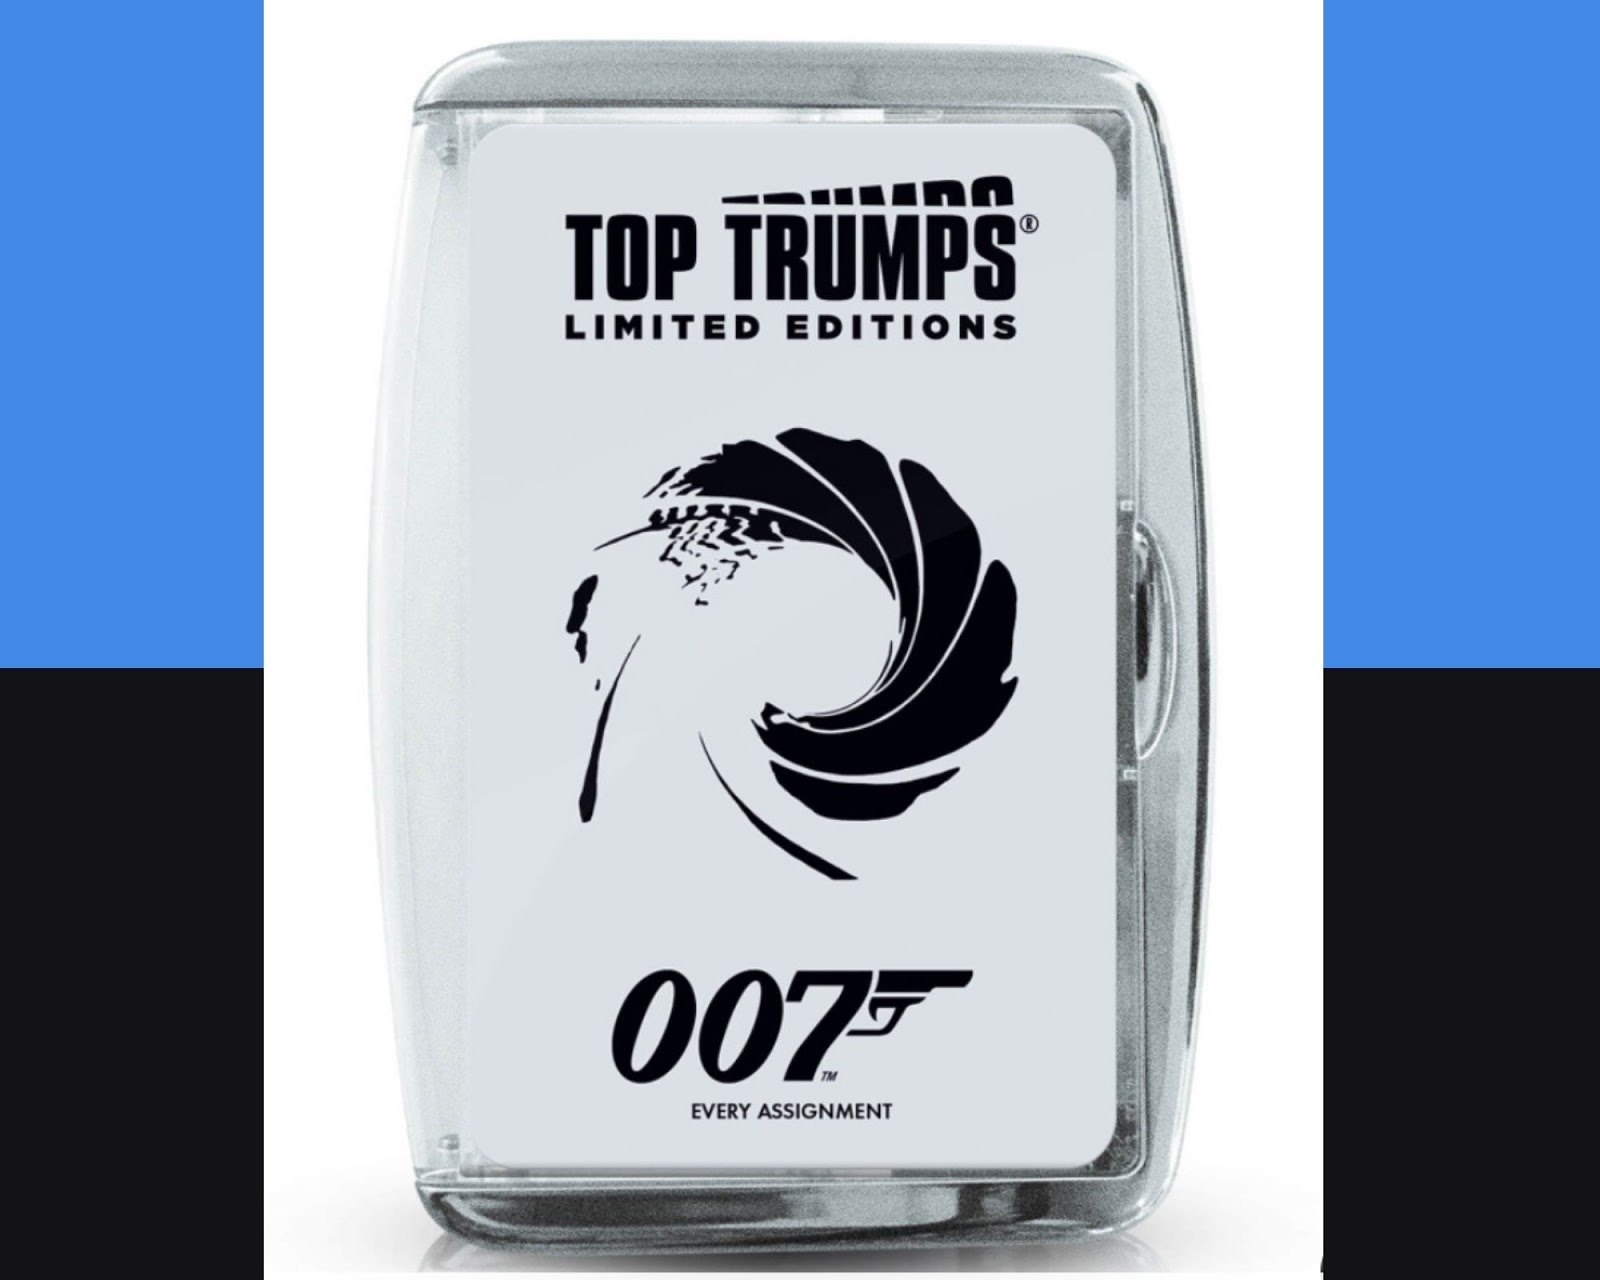 Top Trumps 007 game